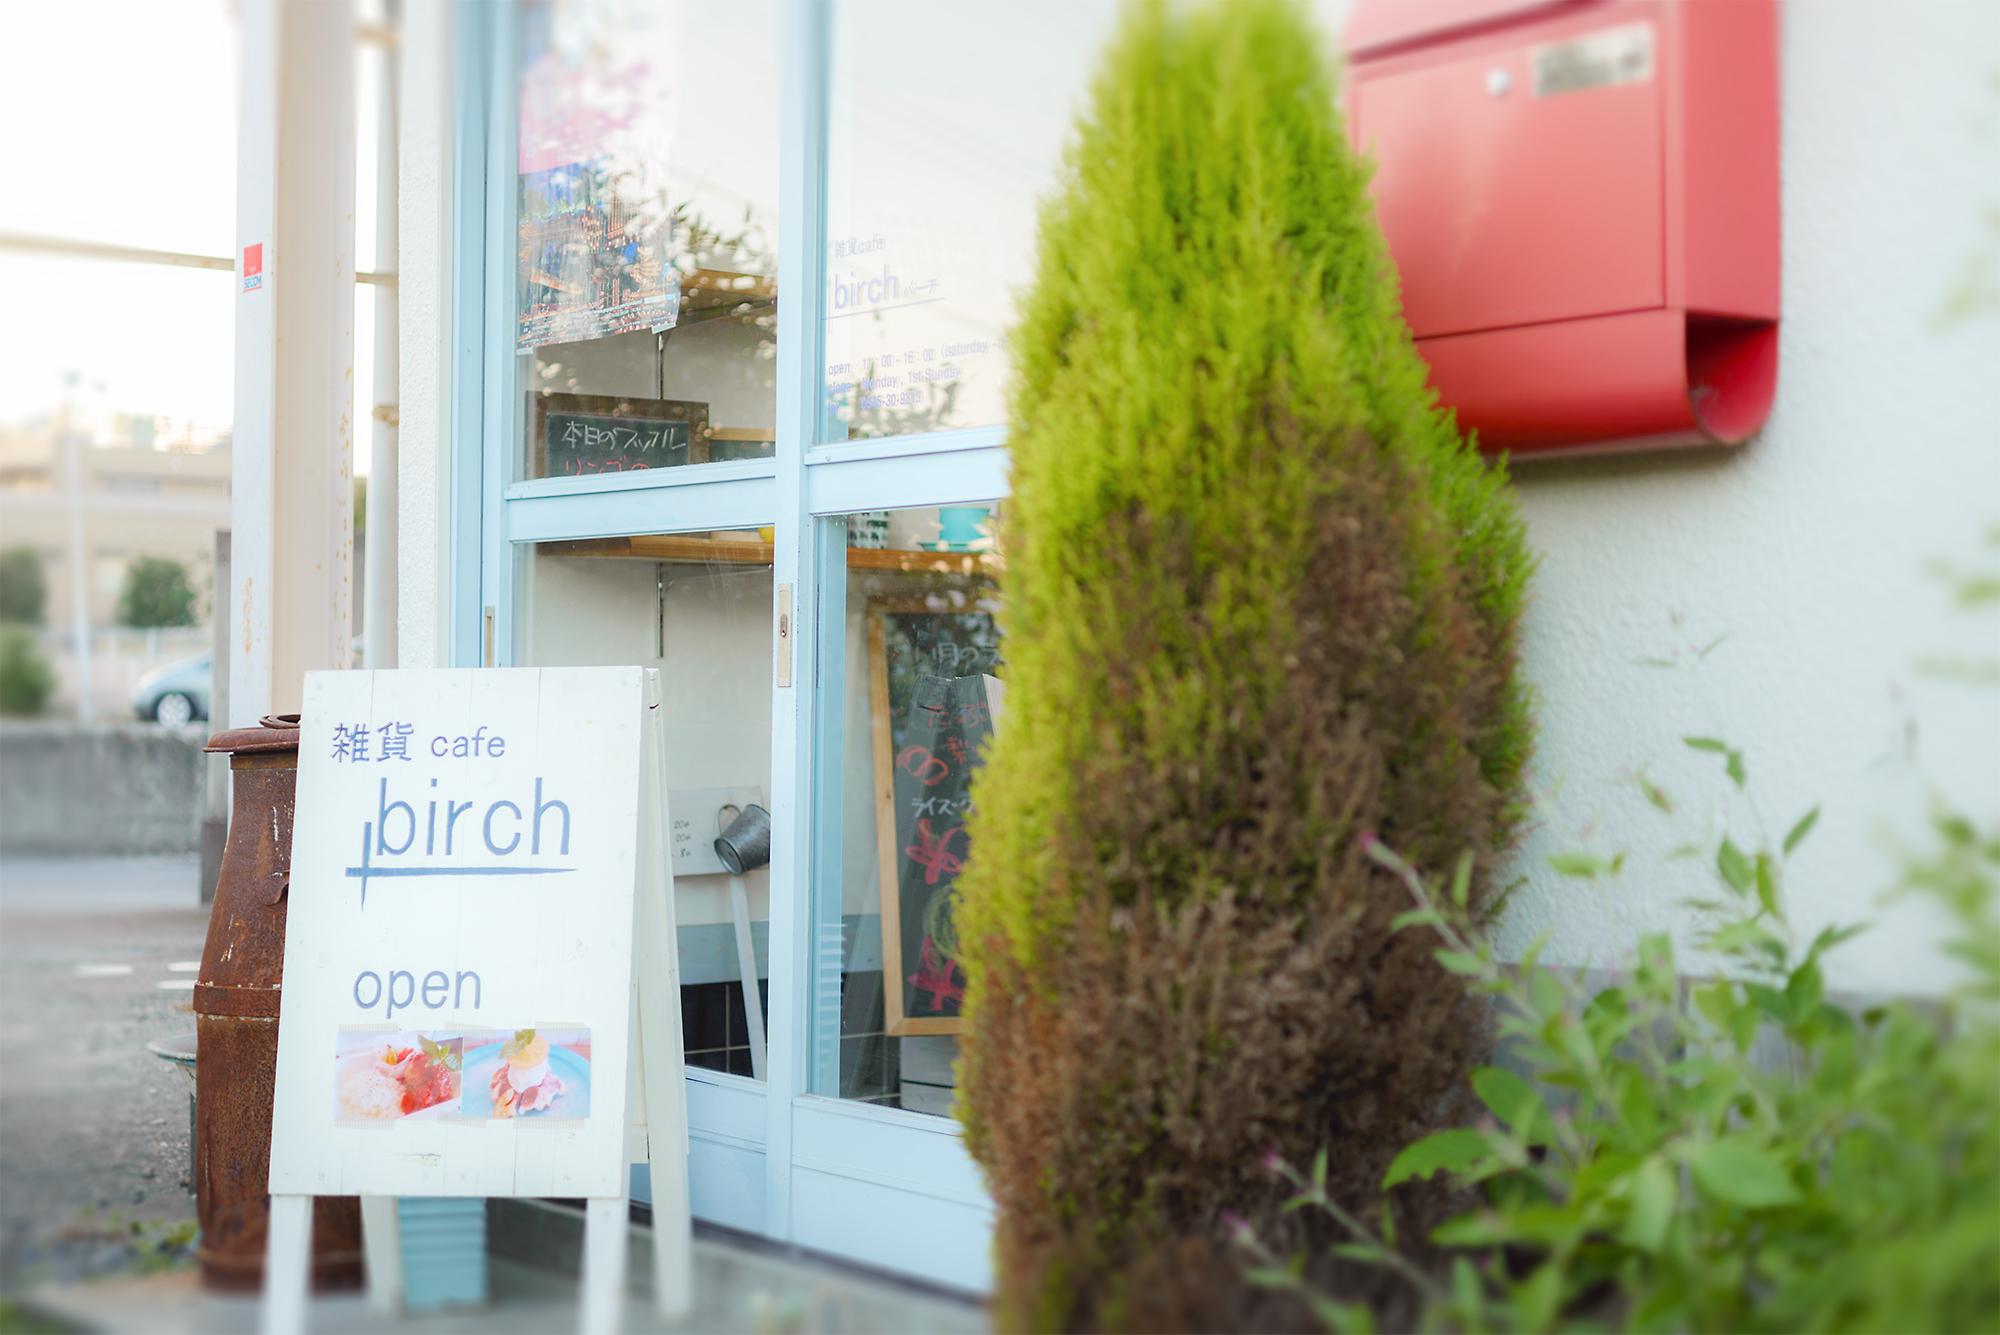 雑貨cafe birch